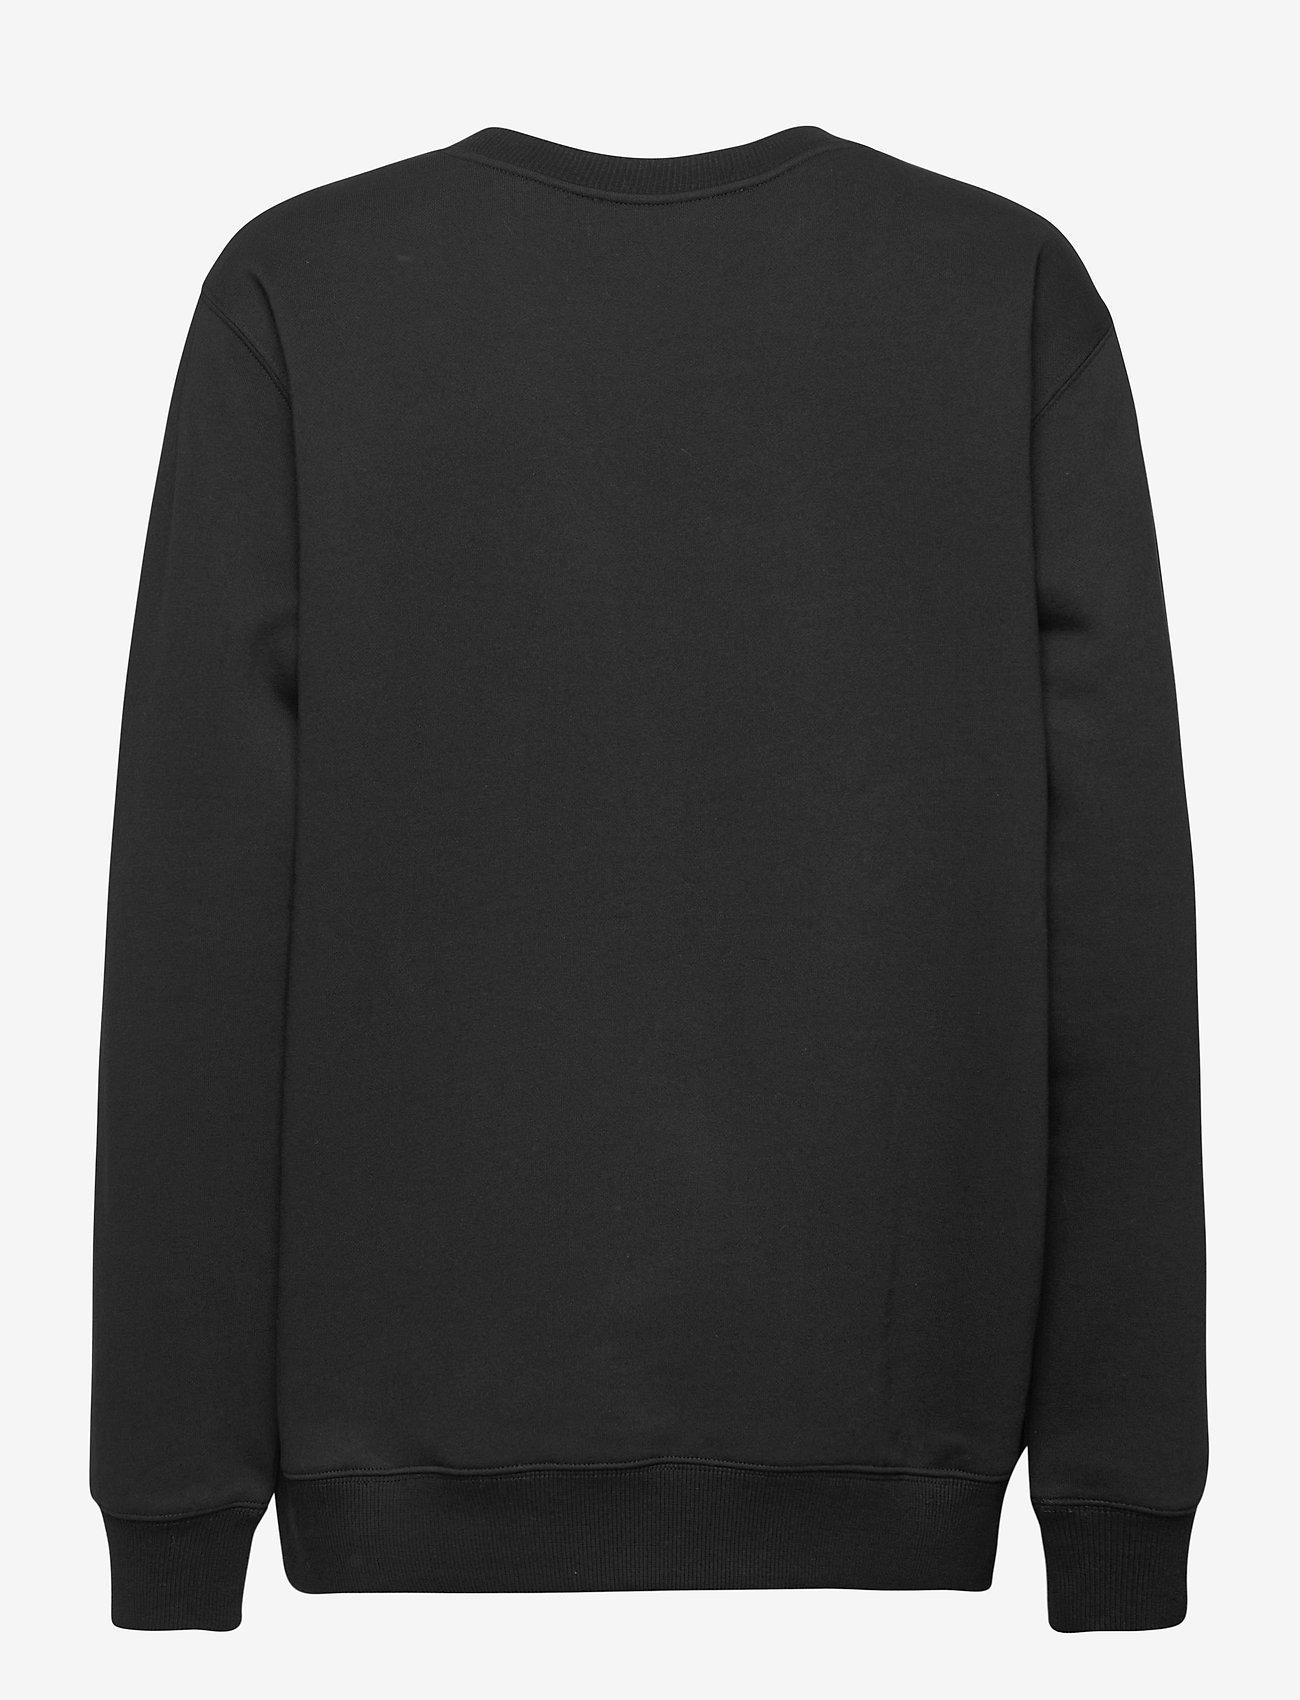 Michael Kors - UNISEX TONAL SWEATSHIRT - sweatshirts en hoodies - black - 1